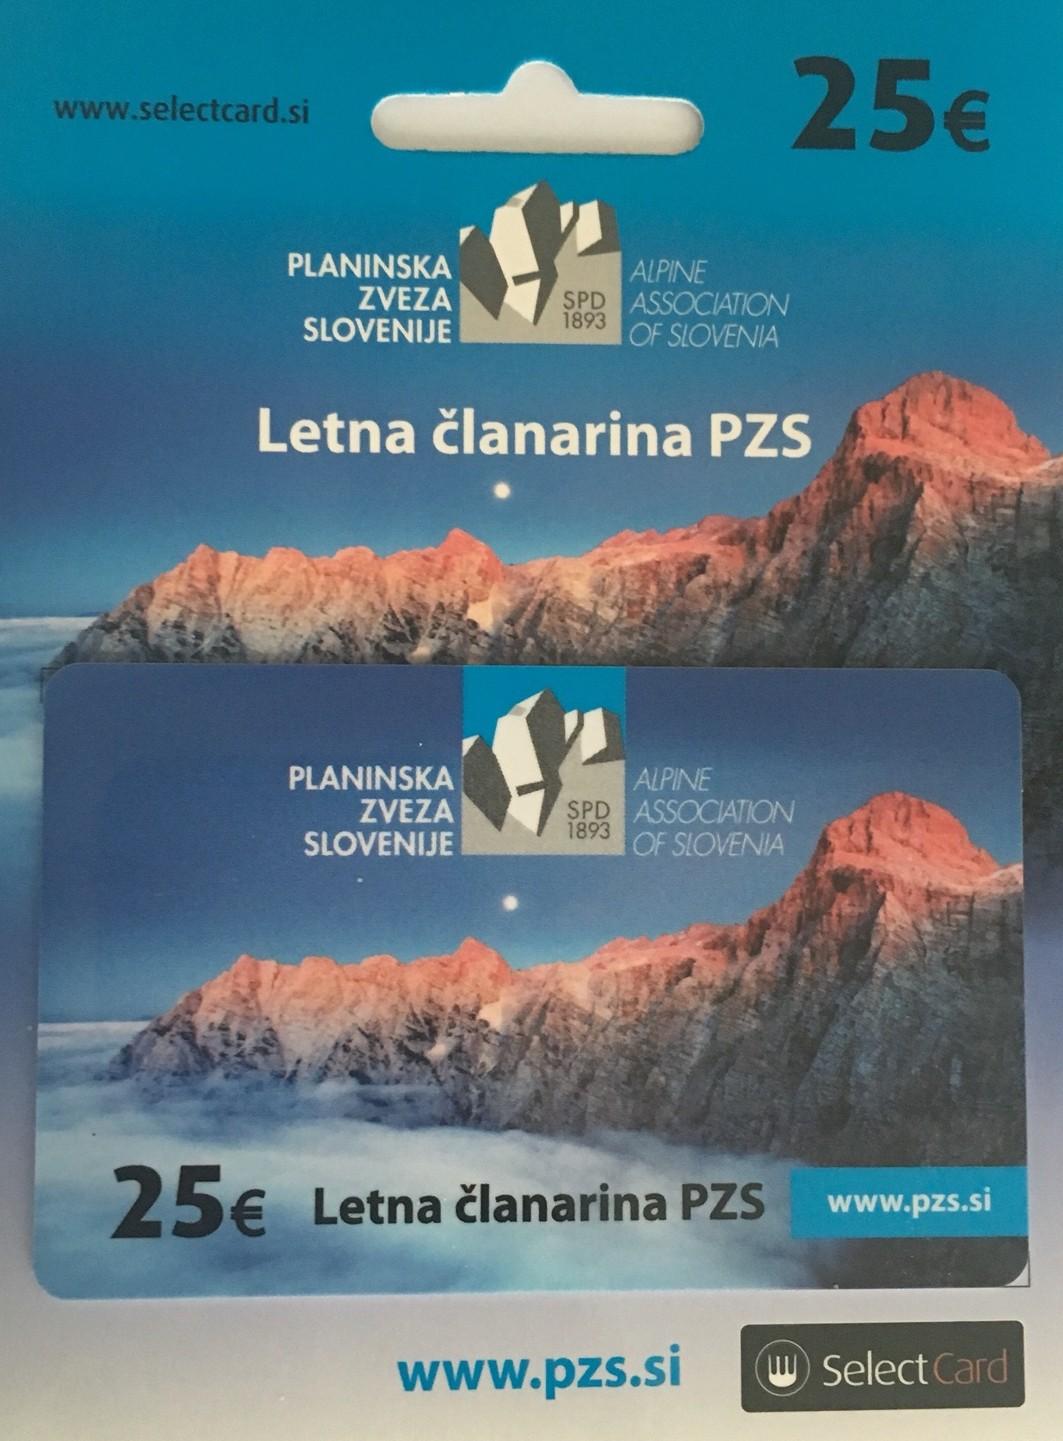 clanarina_pzs_selectcard_kartica